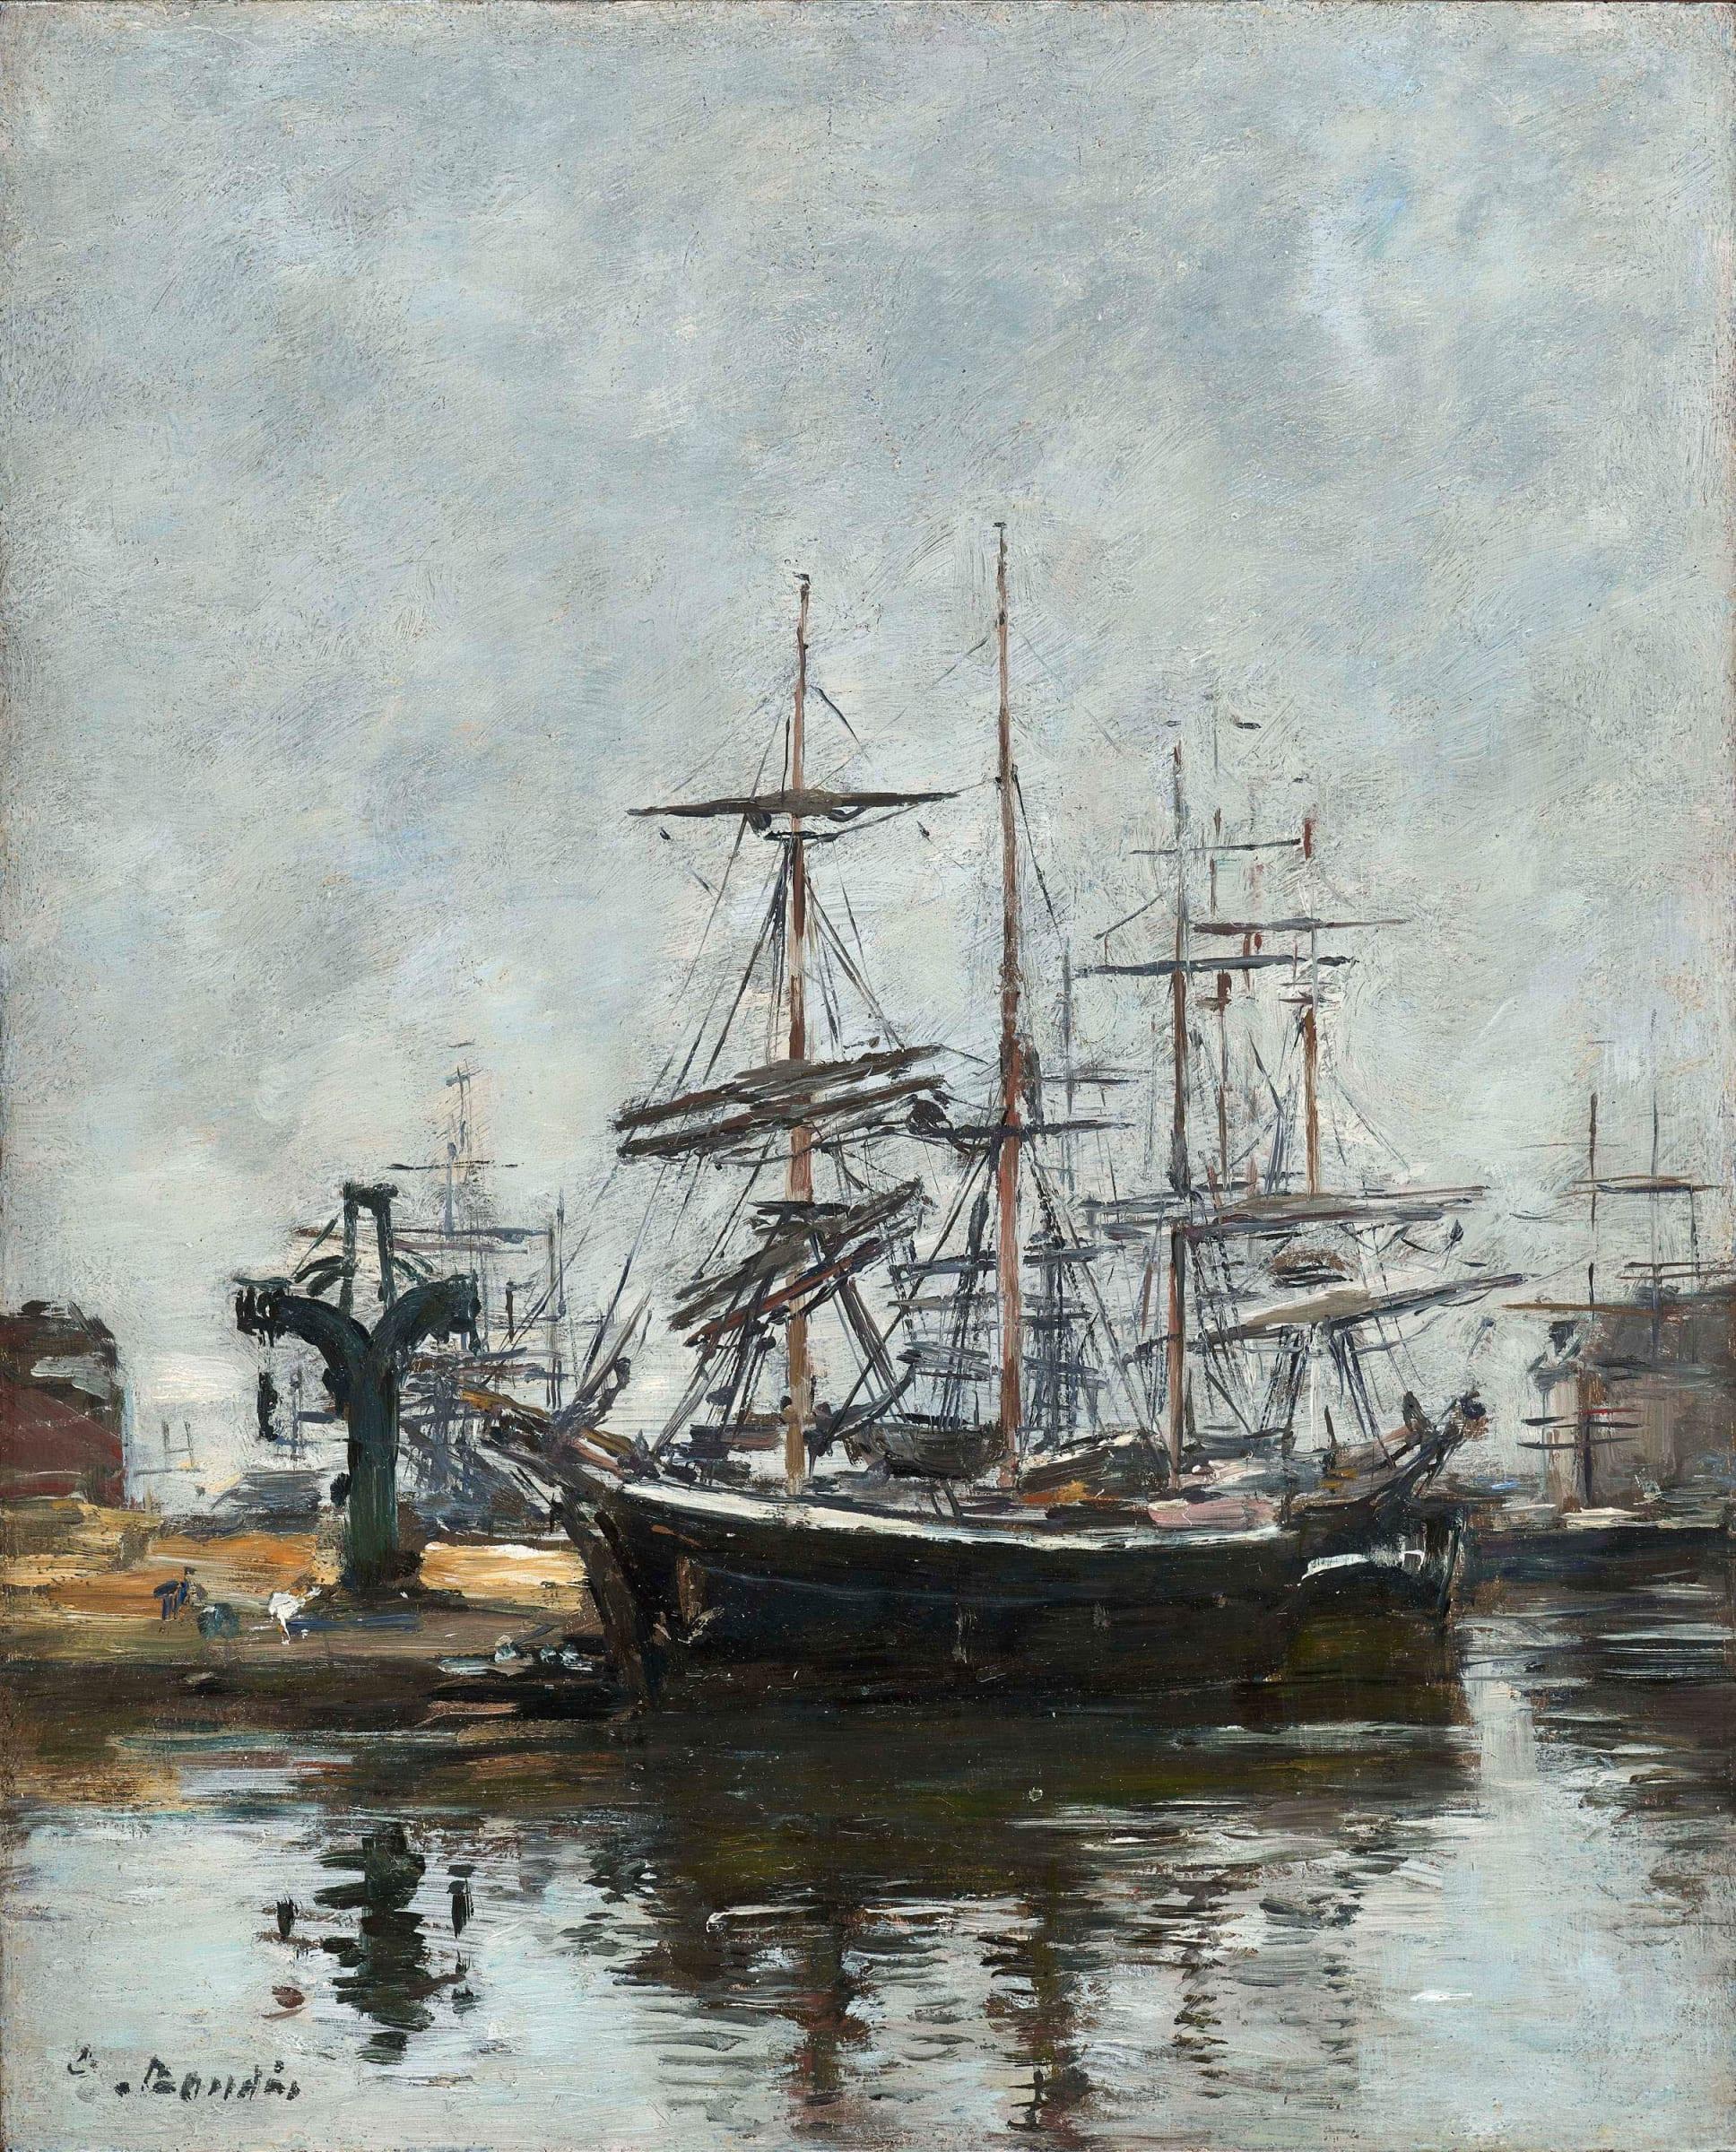 "<span class=""link fancybox-details-link""><a href=""/artists/29-eugene-boudin/works/9376-eugene-boudin-le-havre-voiliers-a-quai-bassin-de-la-c.-1885-1890/"">View Detail Page</a></span><div class=""artist""><span class=""artist""><strong>Eugène Boudin</strong></span></div><div class=""title""><em>Le Havre, voiliers à quai, bassin de la Barre</em>, c. 1885-1890</div><div class=""signed_and_dated"">Signed lower left</div><div class=""medium"">Oil on board</div><div class=""dimensions"">26.5 x 21.5 cm<br /> 10 ½ x 8 ½ inches</div>"